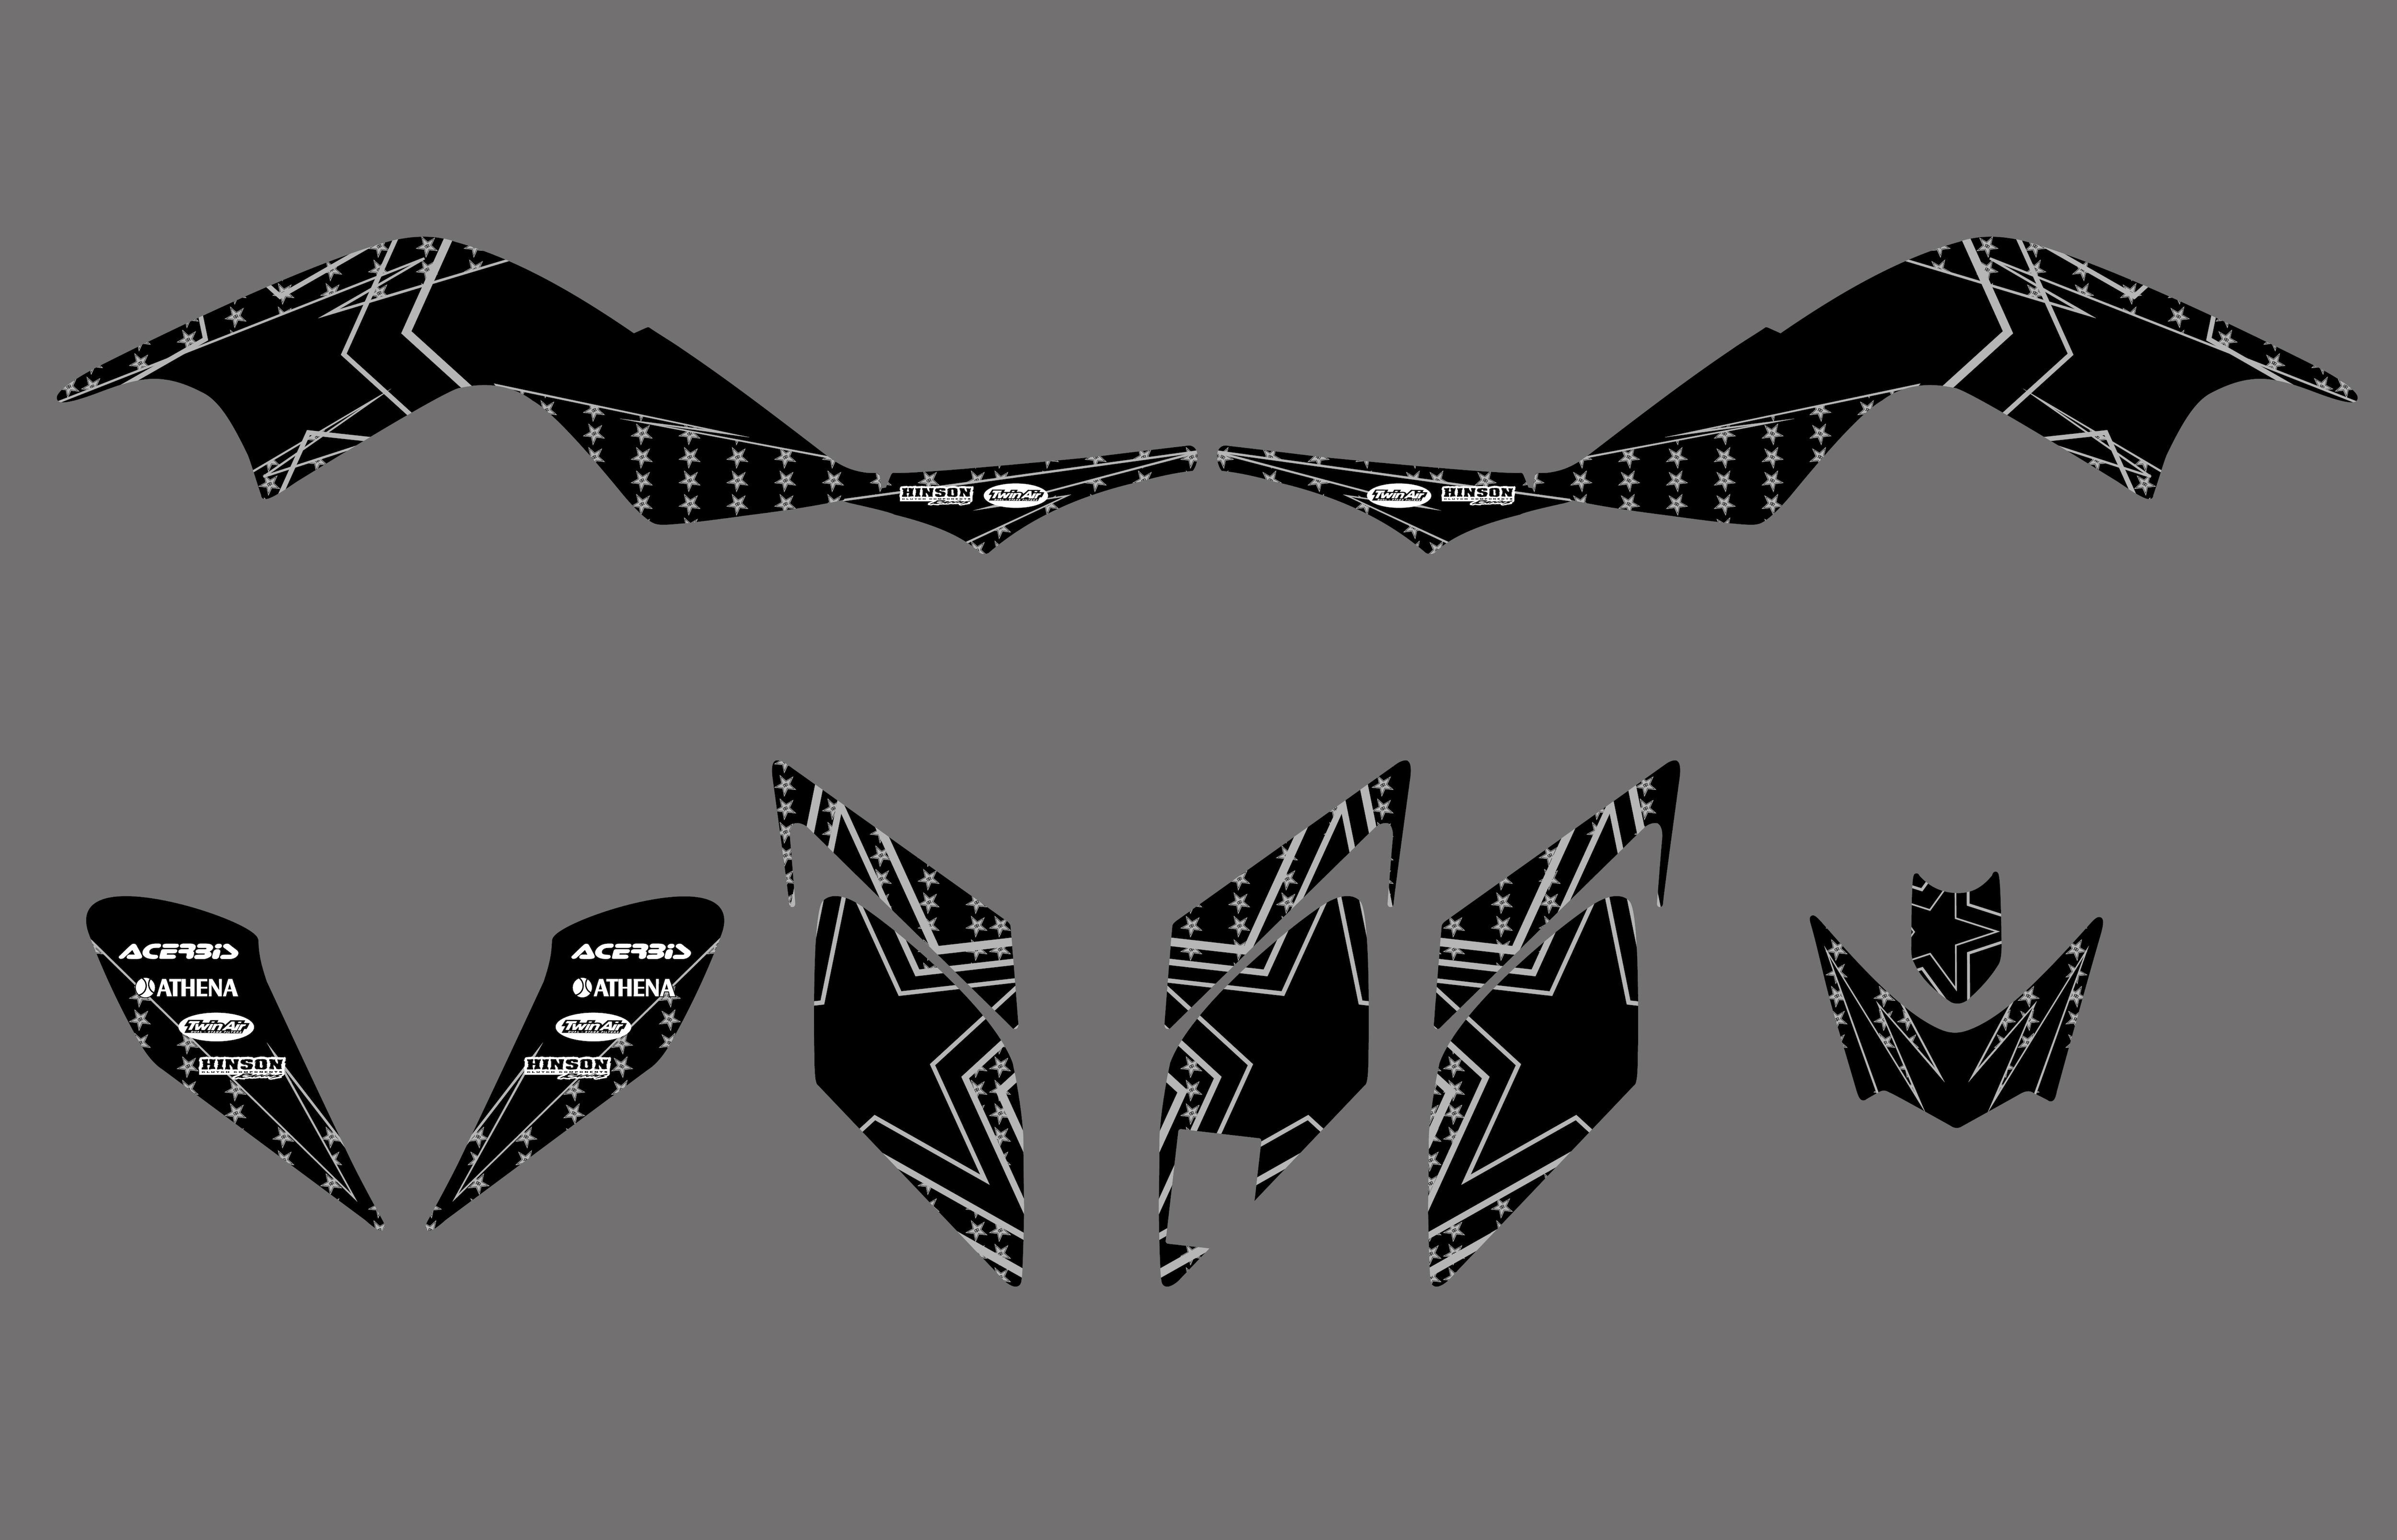 New TEAM DECALS STICKERS Graphics Kits For Yamaha RAPTOR 700 YFM700 ATV 2006 2007 2008 2009 2010 2011 2012  Pegatina